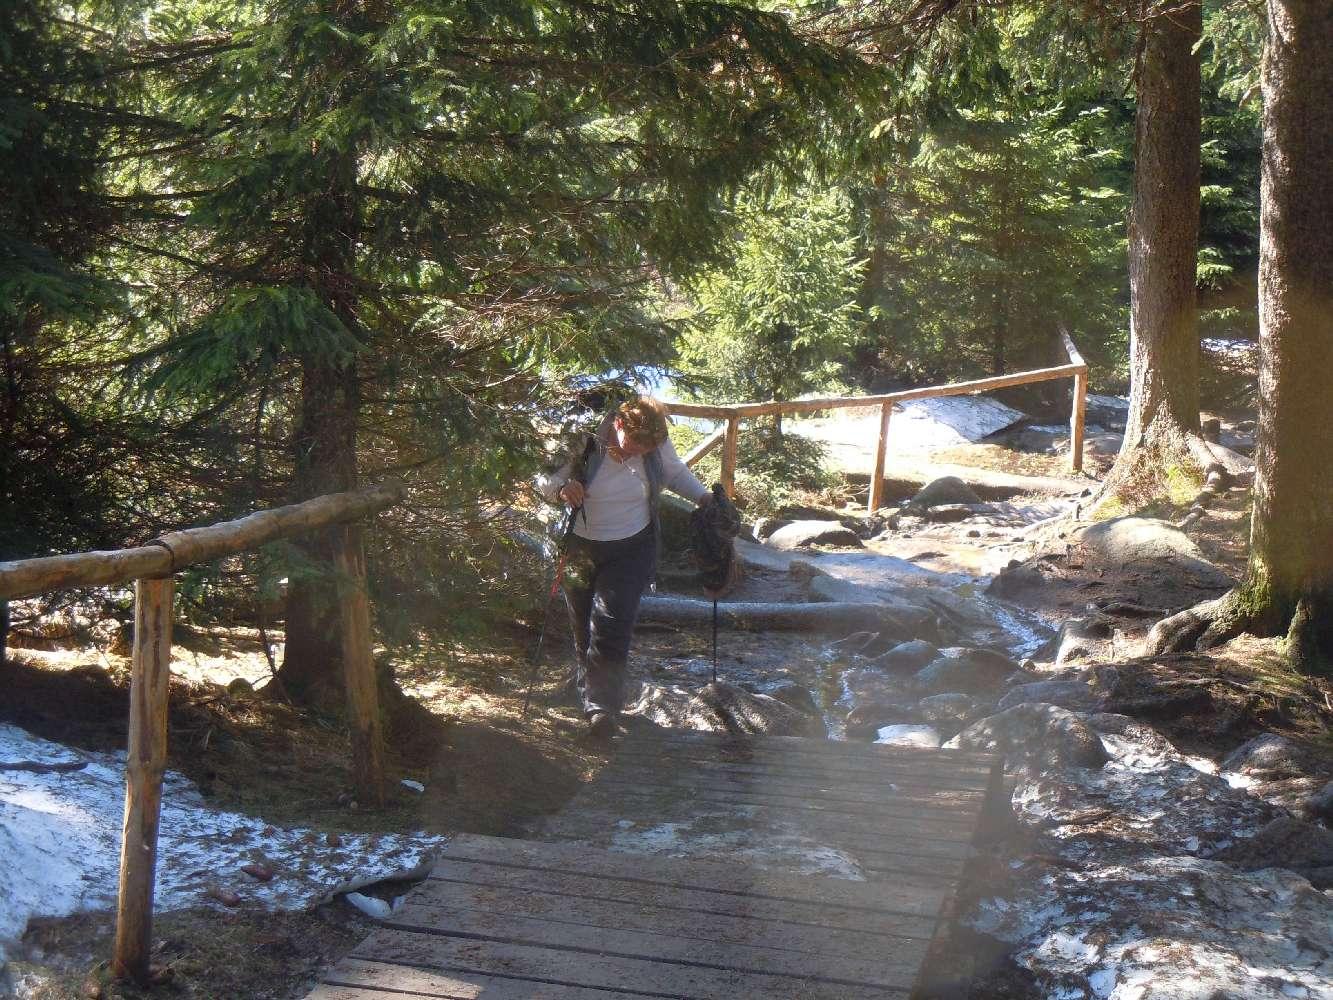 Hiking am Brocken